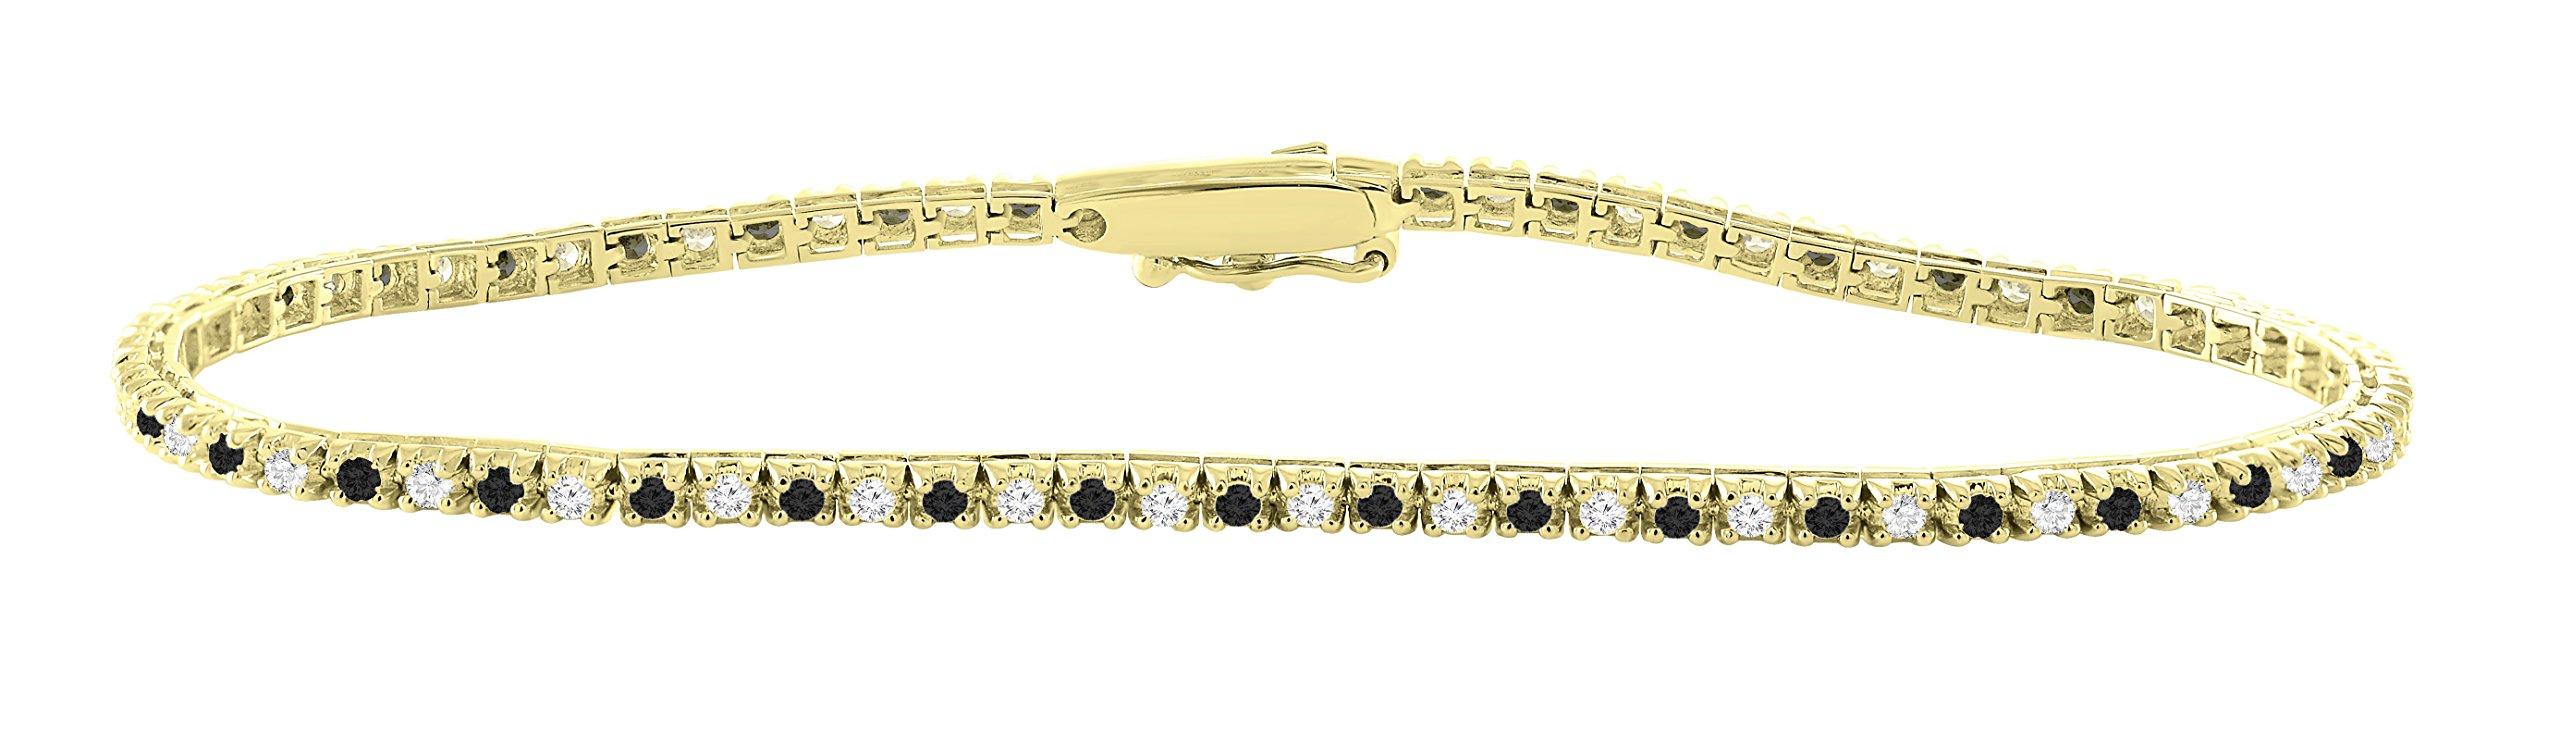 14K Yellow Gold 1.00 Carat (ctw) Real Natural Black & White Diamond Tennis Bracelet For Women 7 Inches